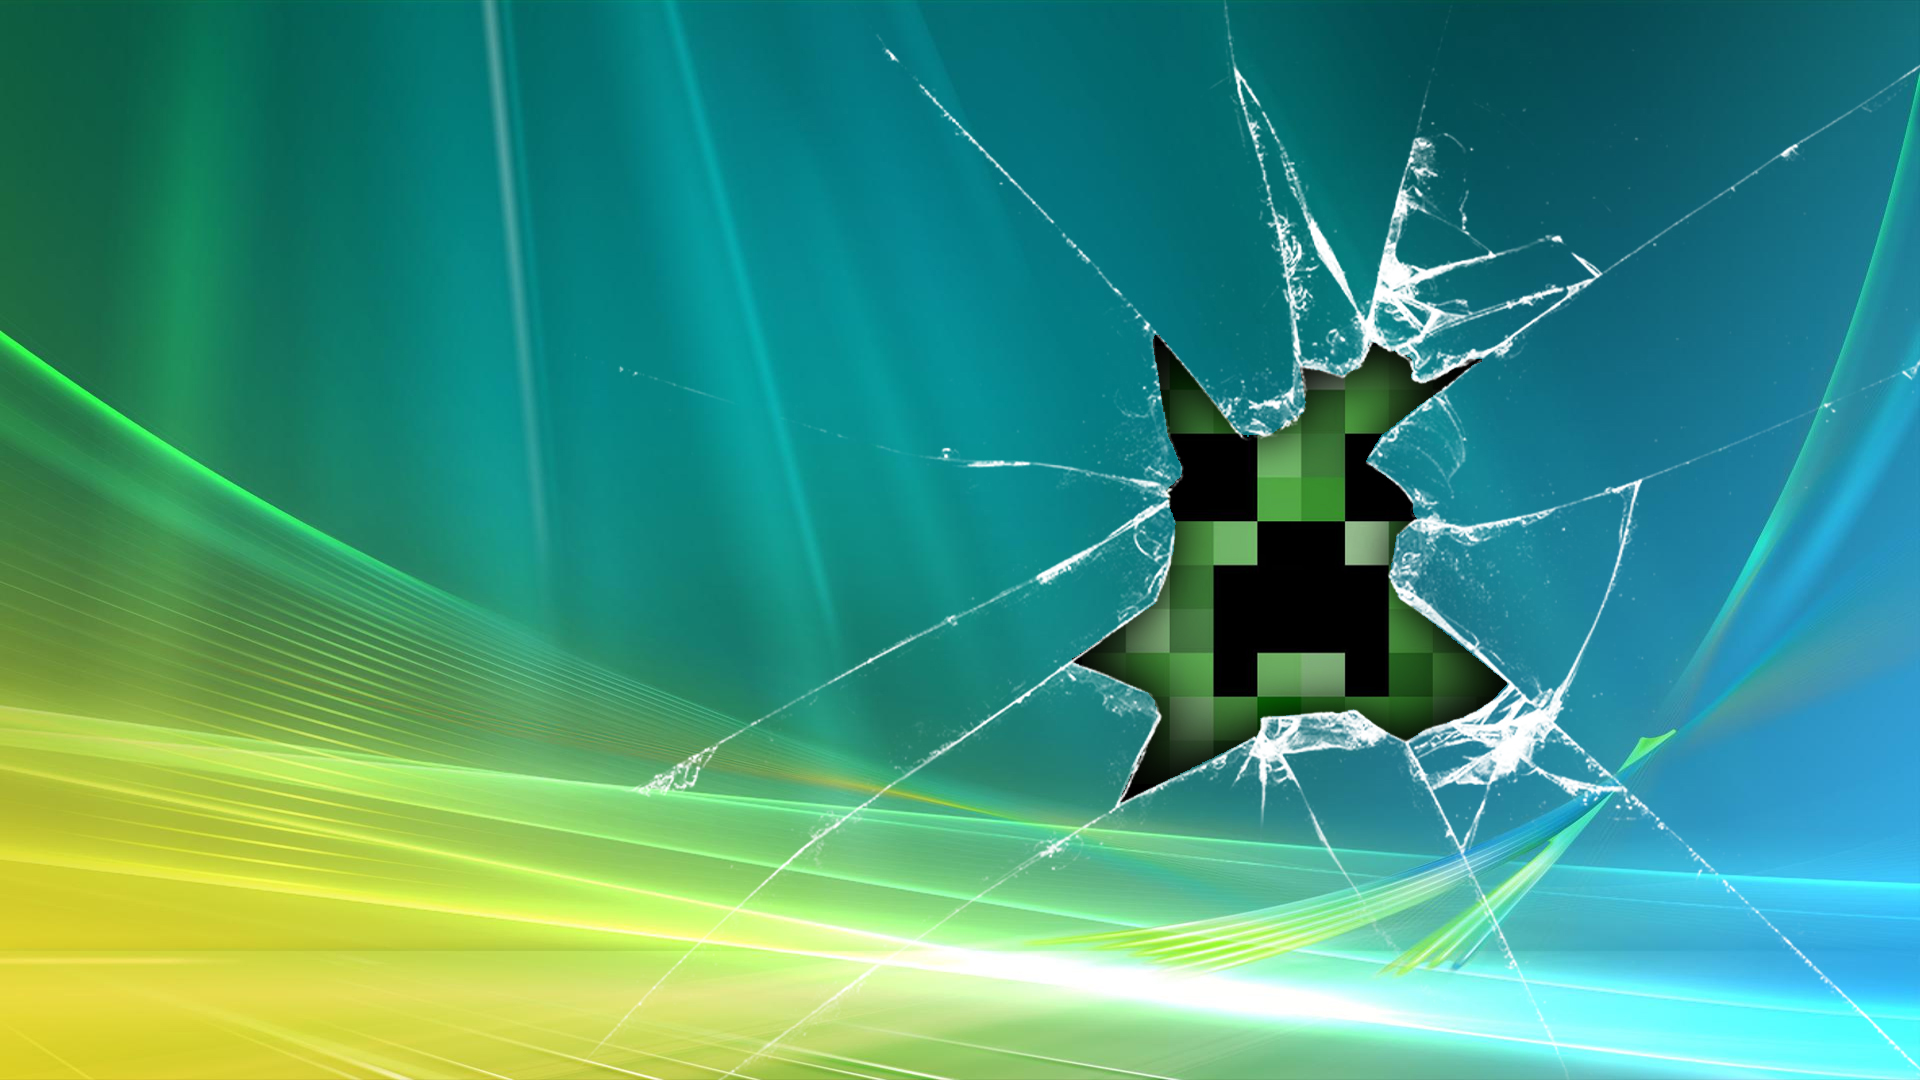 broken screen wallpaper 635385